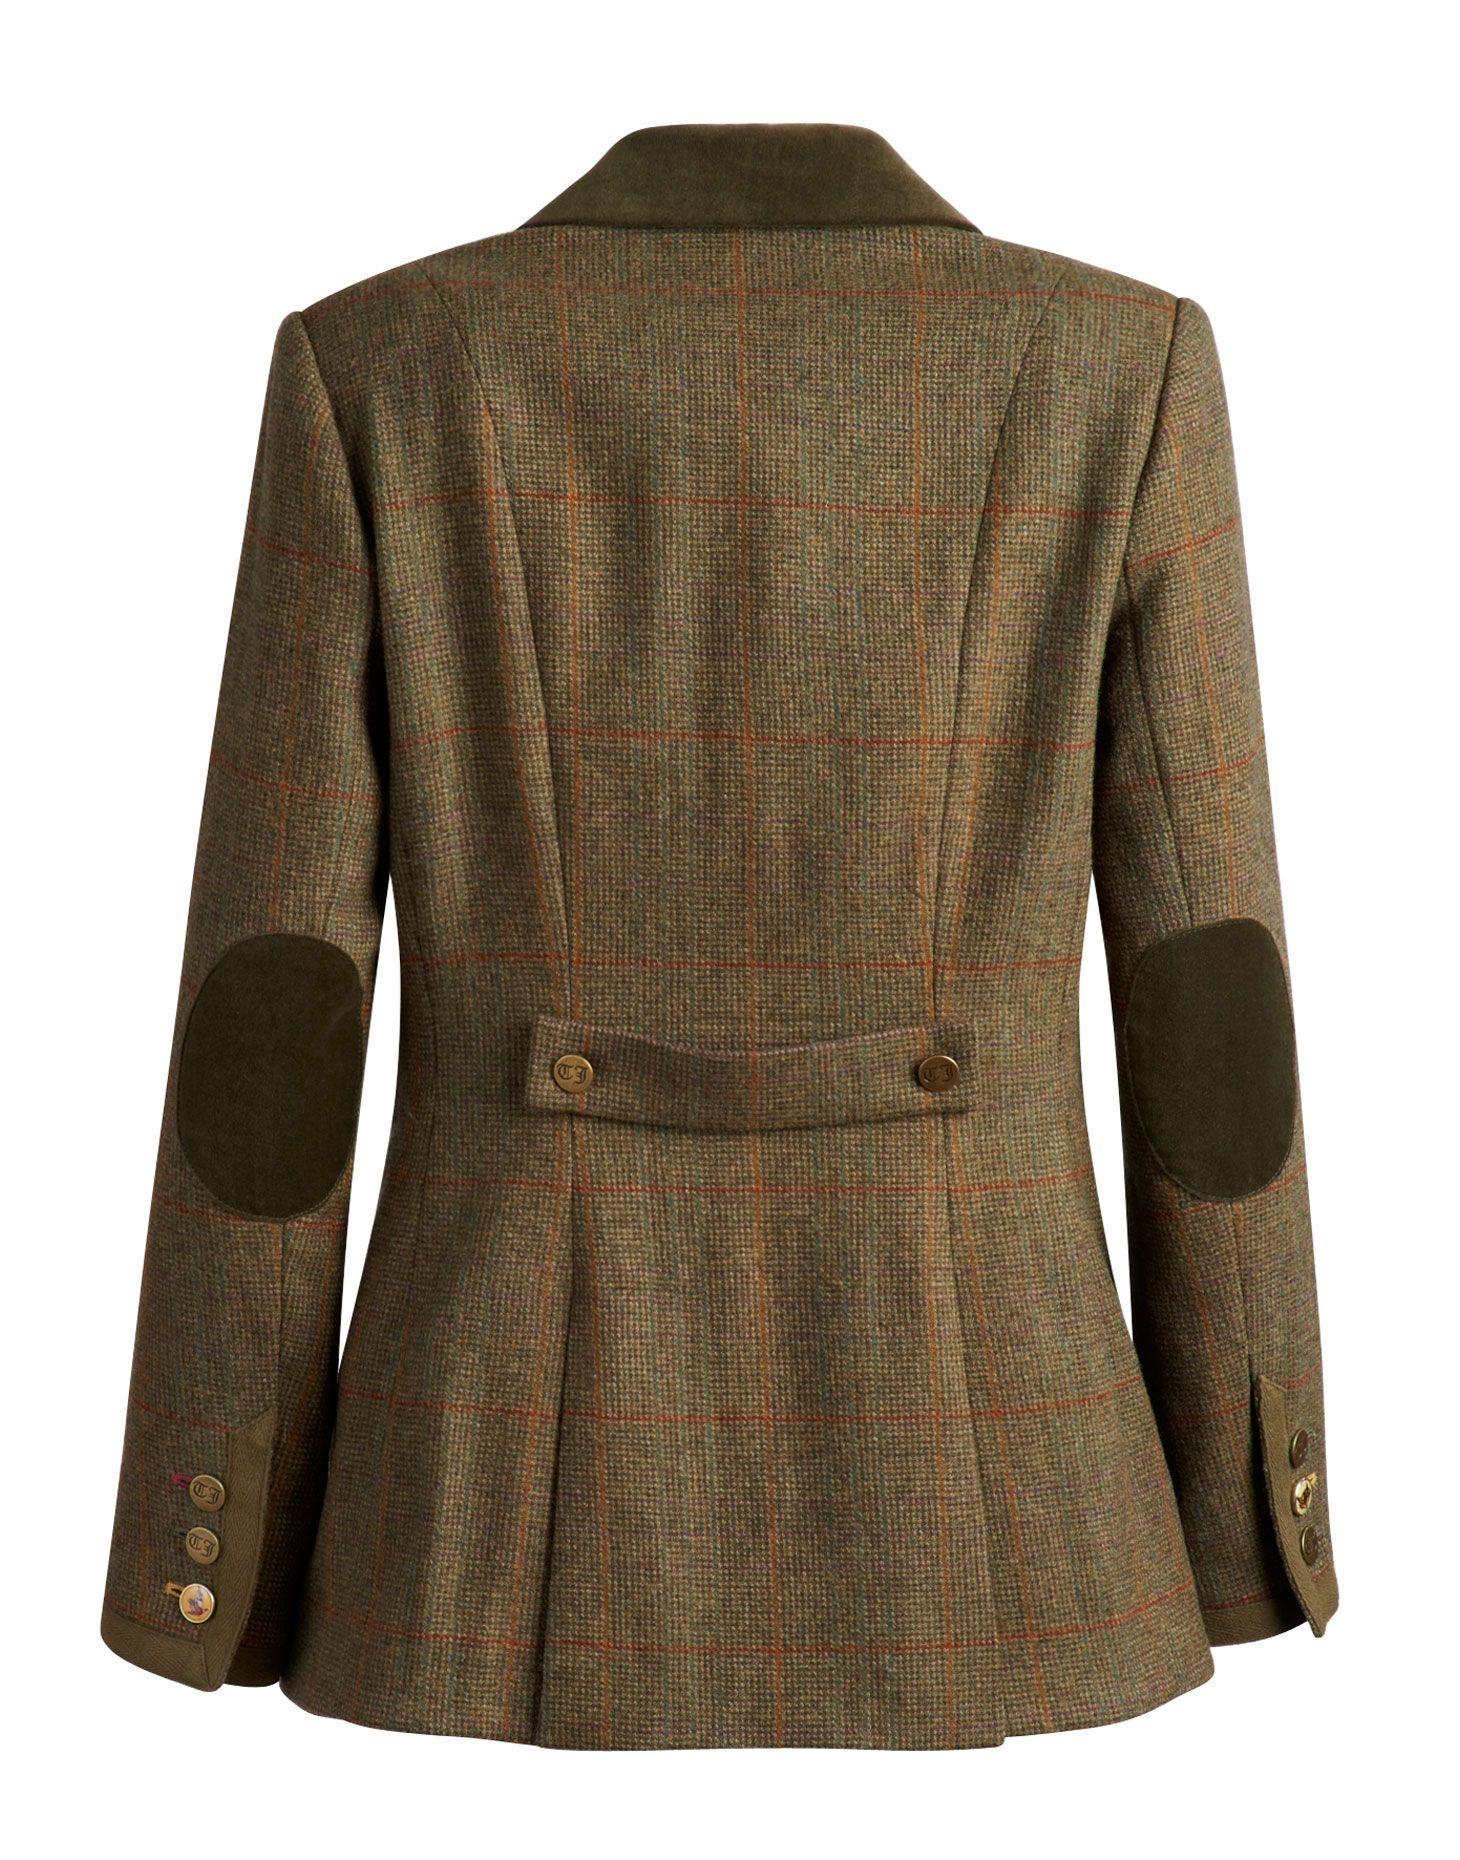 AUSTINE Womens Tweed Riding Jacket | FASHION | Equestrian ...